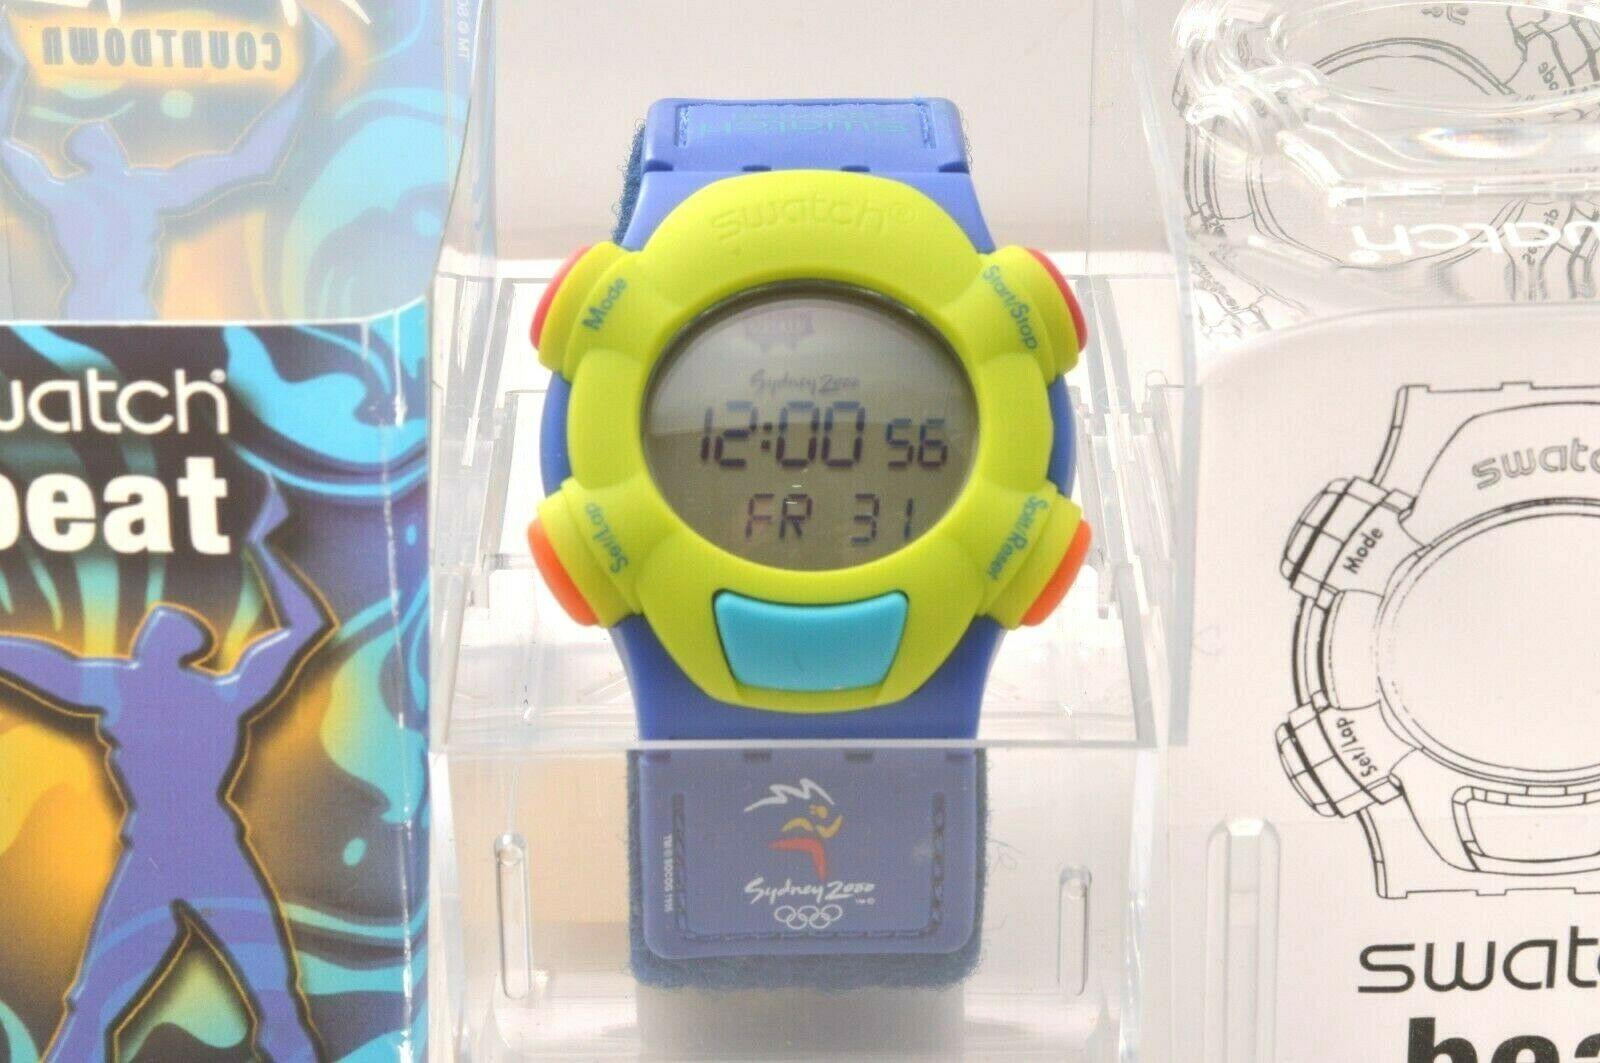 Swatch .beat for Sydney Olympics 2000